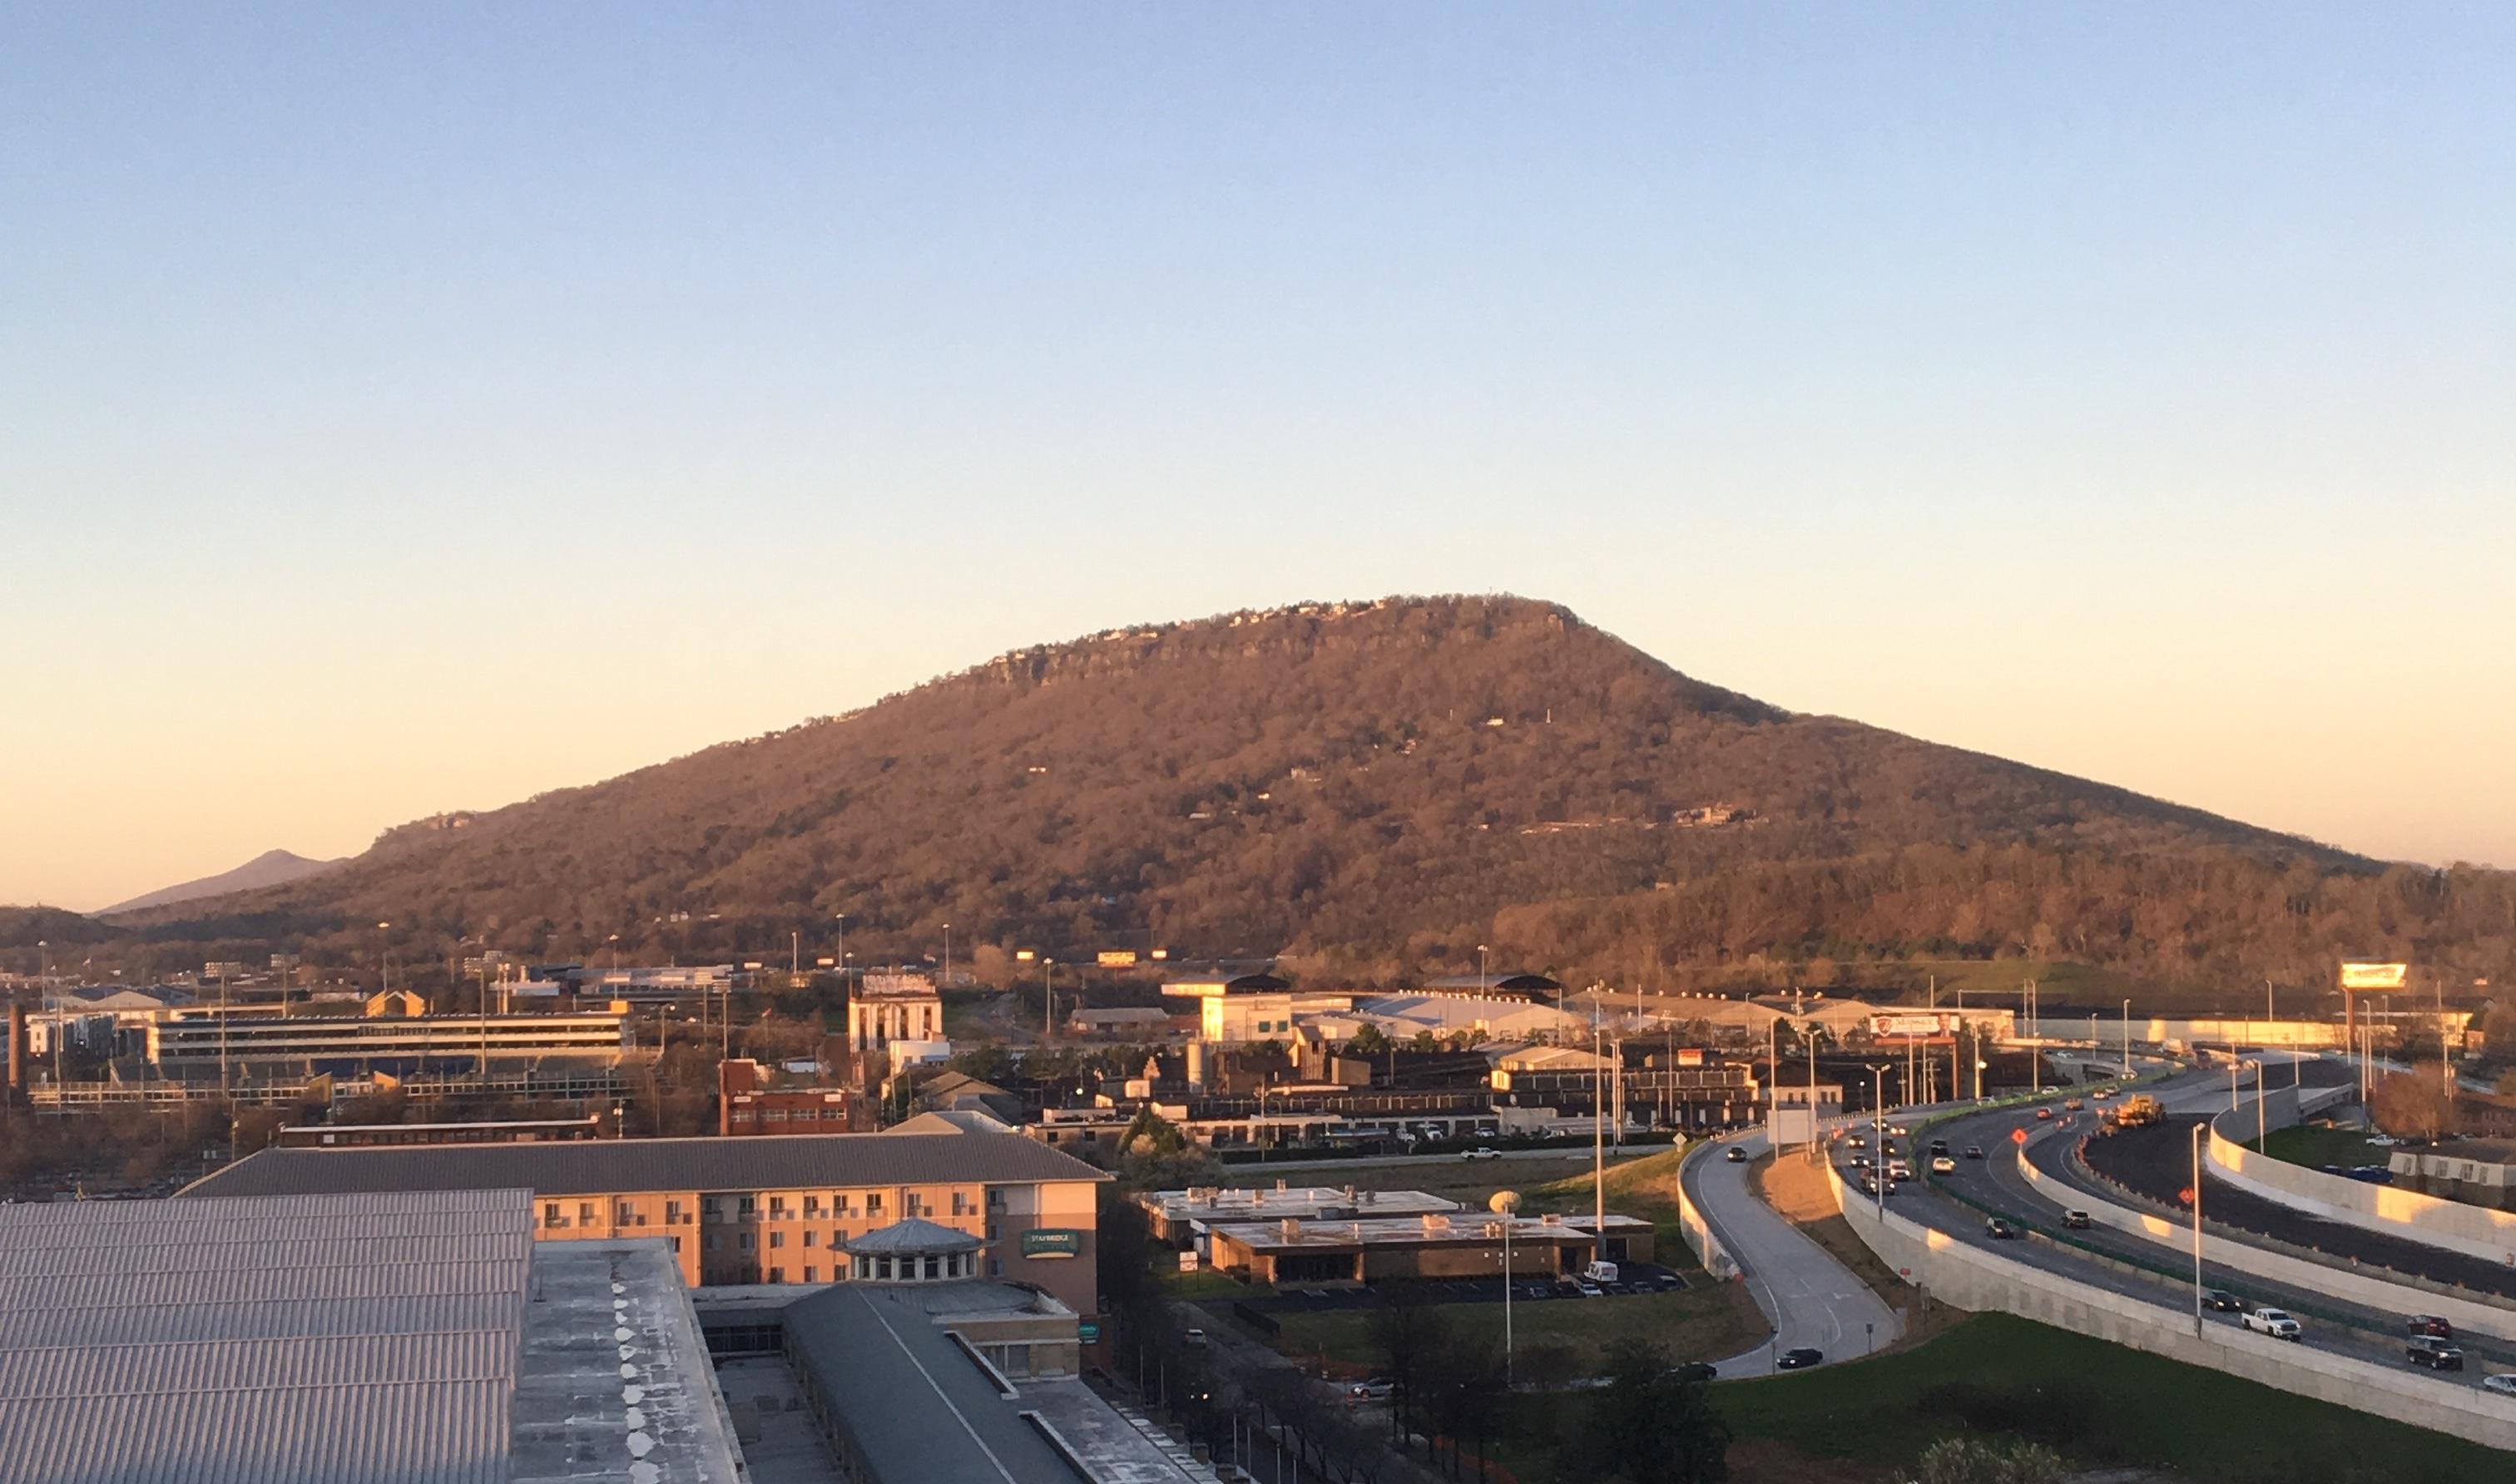 Lookout Mountain - Wikipedia